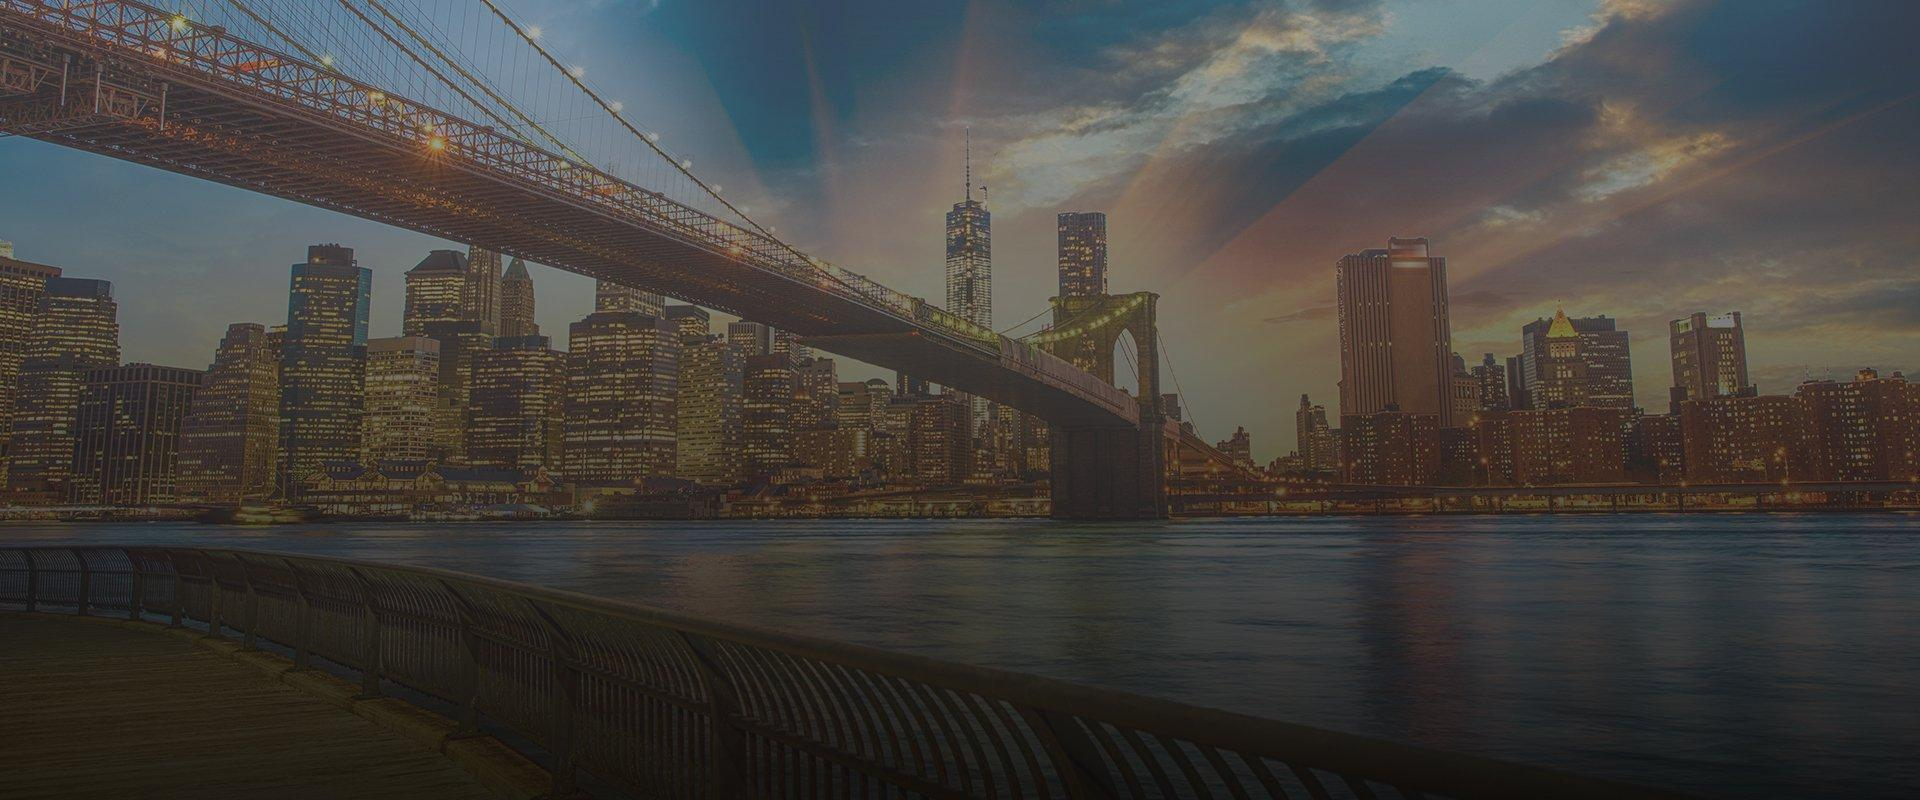 a skyline view of new york city